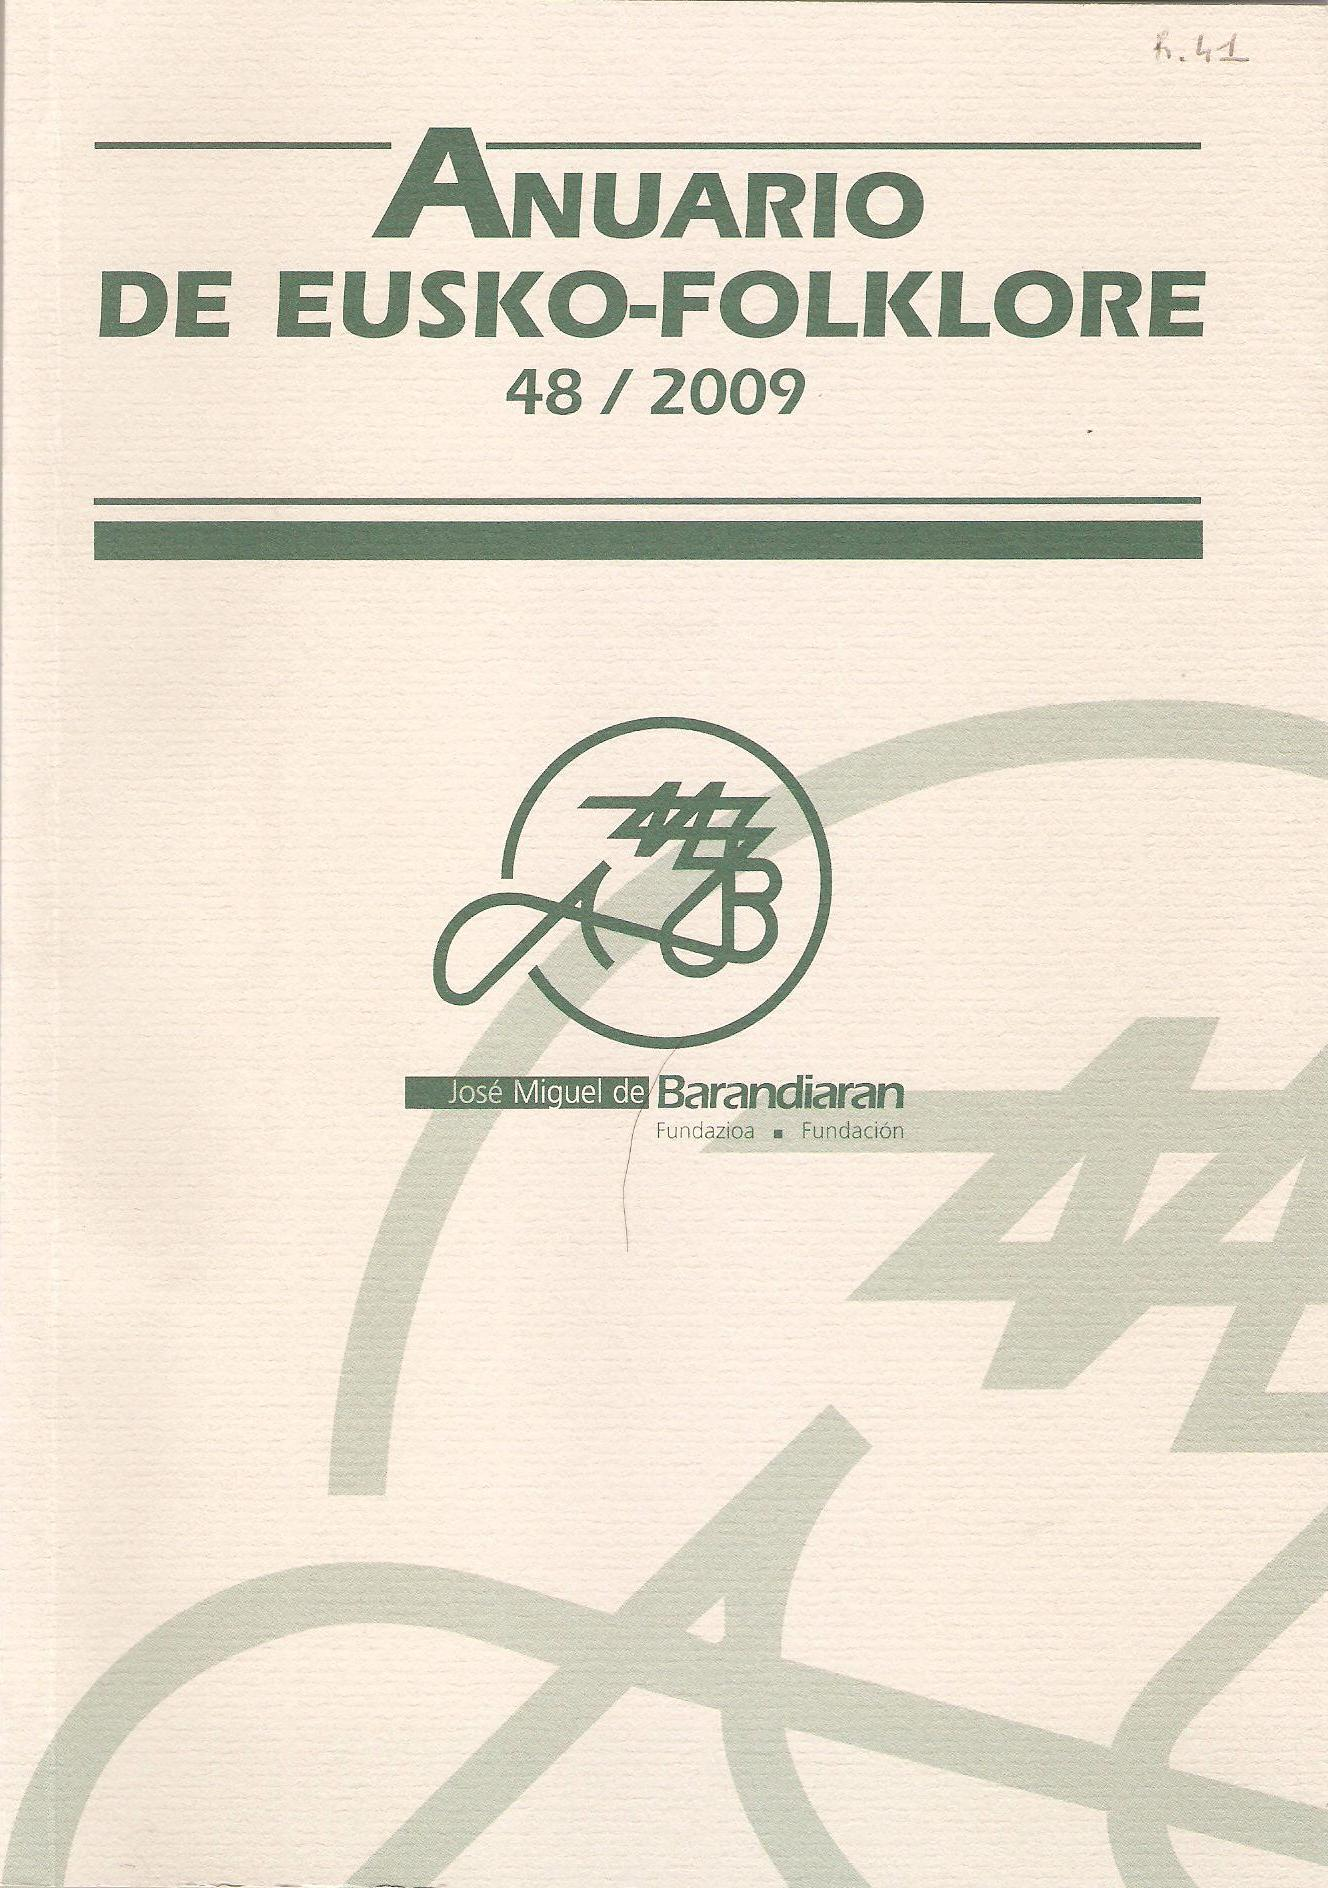 Anuario_de_Eusko_-_folklore.jpg - image/jpeg